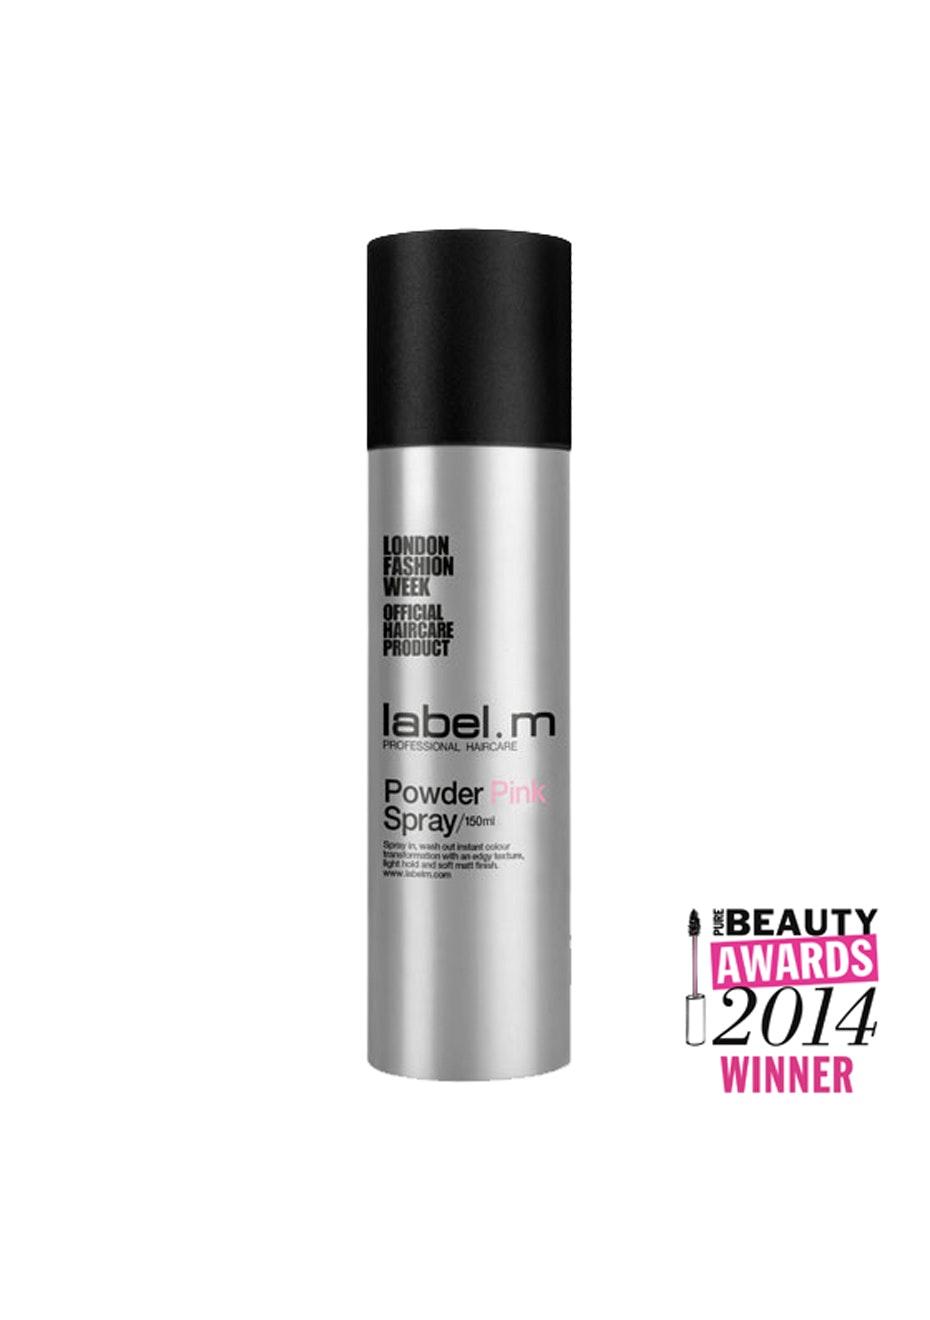 Label M - Powder Pink Spray 150ml